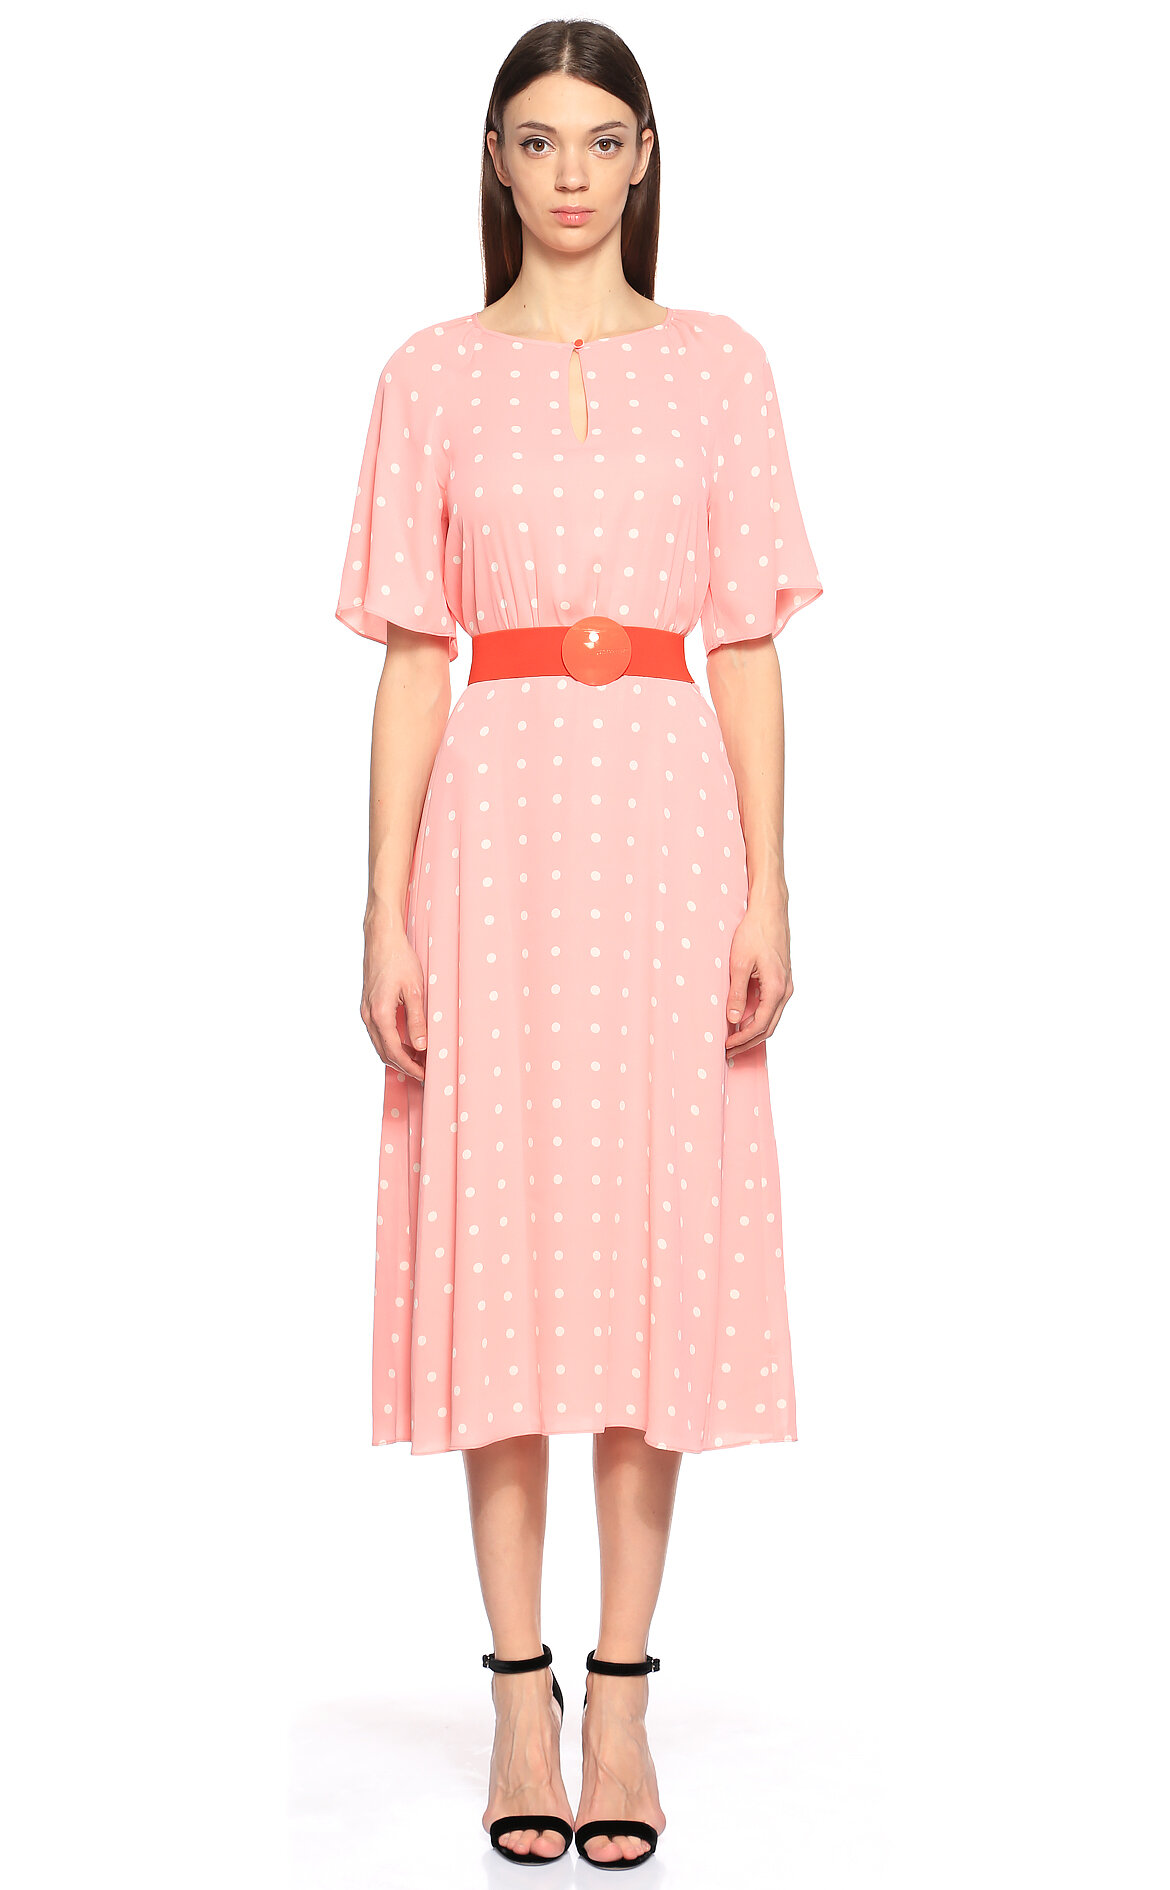 Juicy Couture-Juicy Couture Puantiyeli Pembe Diz Altı Elbise